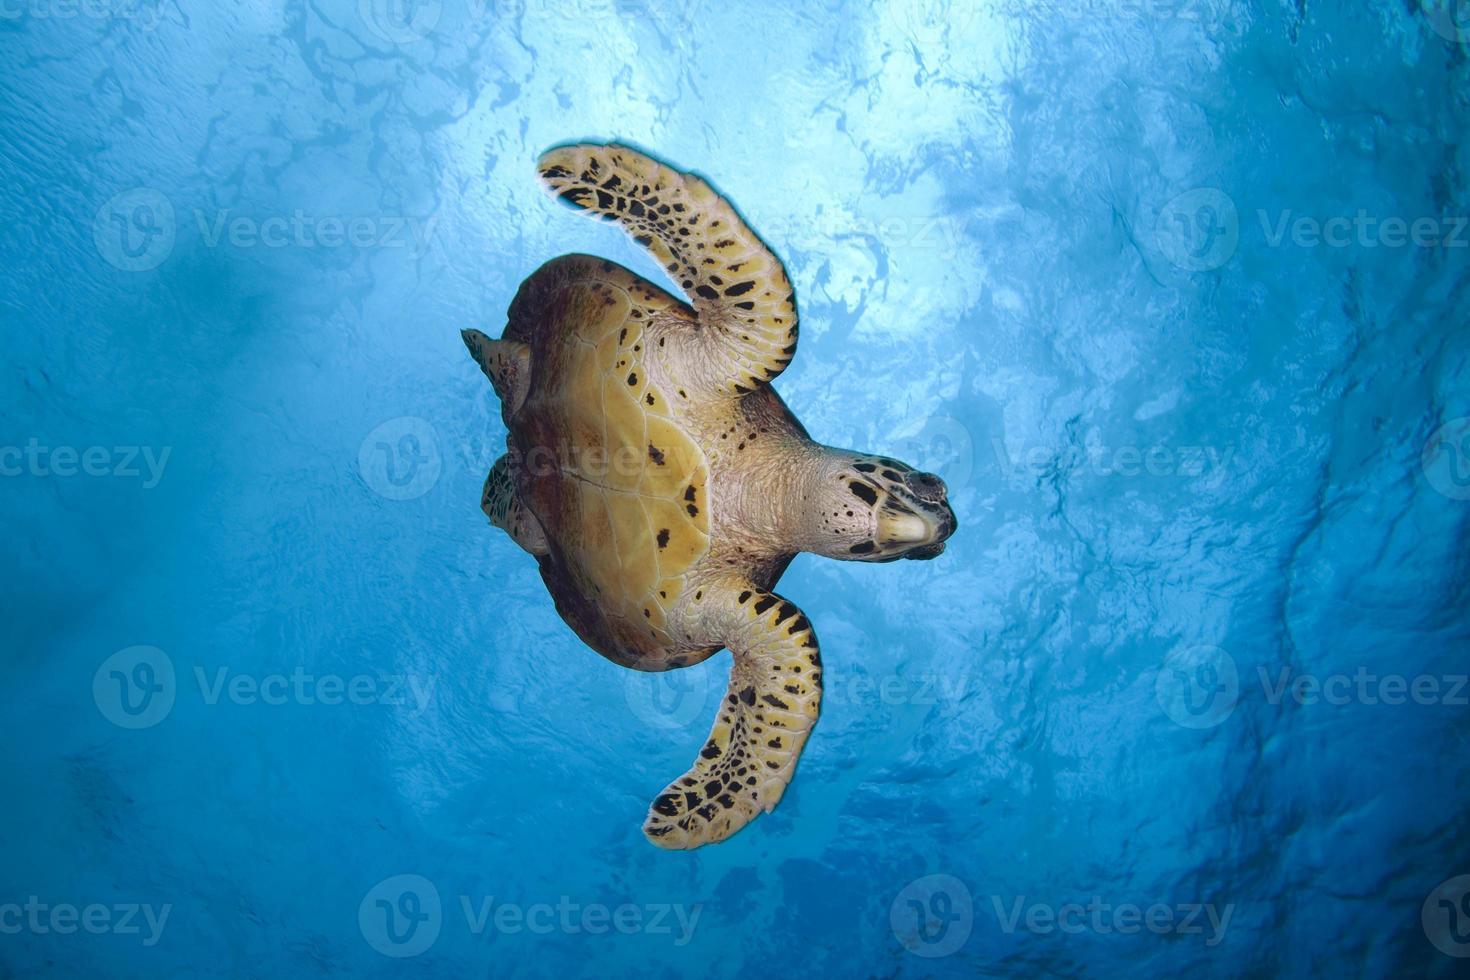 tartaruga-do-mar / tortue ã ã © caille foto